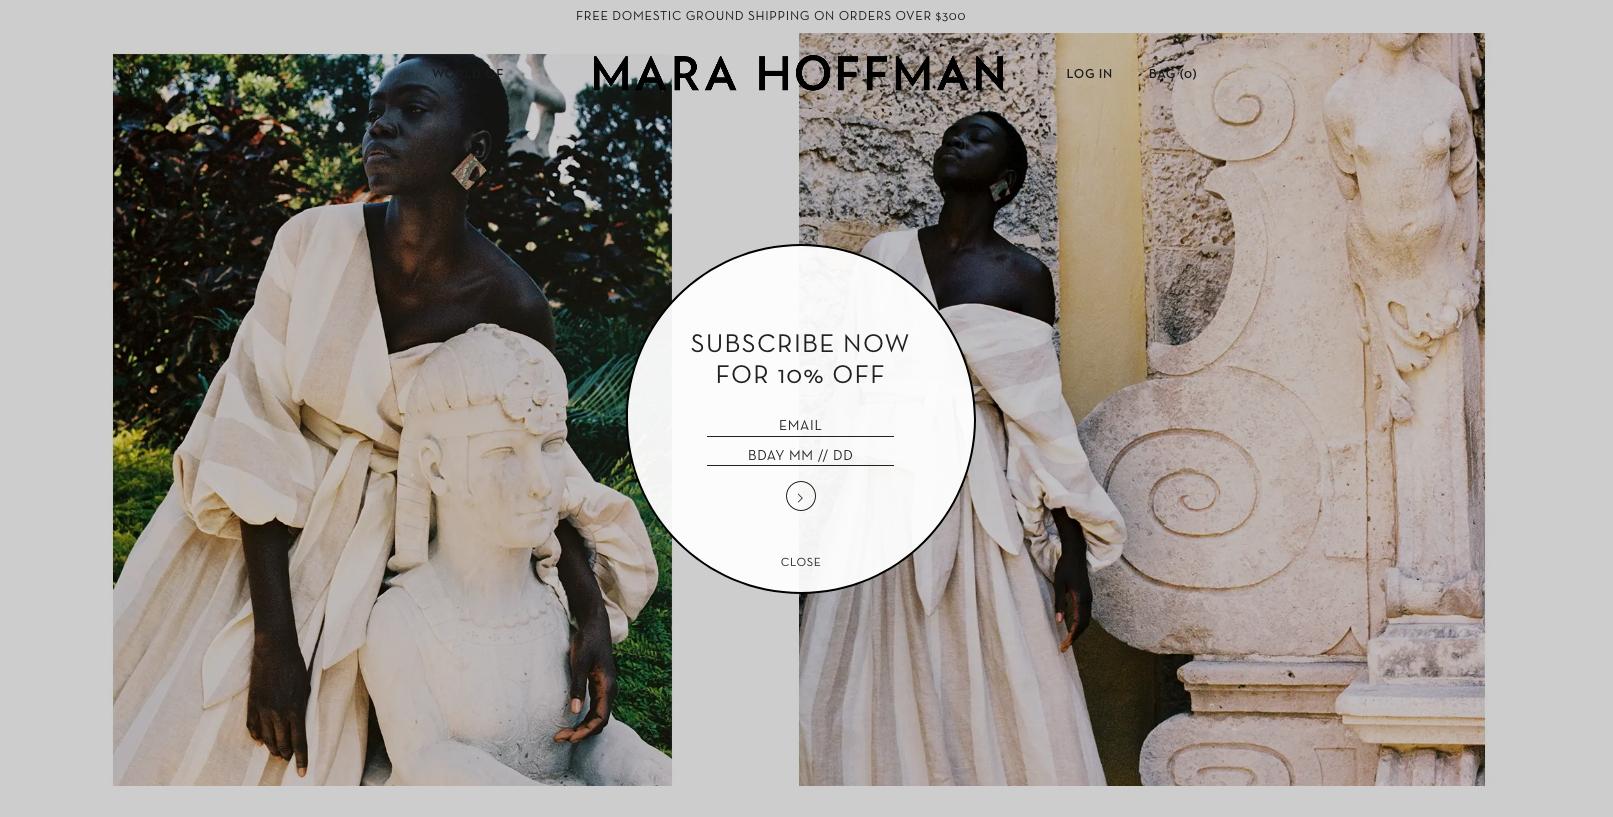 Mara Hoffman Globe Shaped Popup on the Homepage